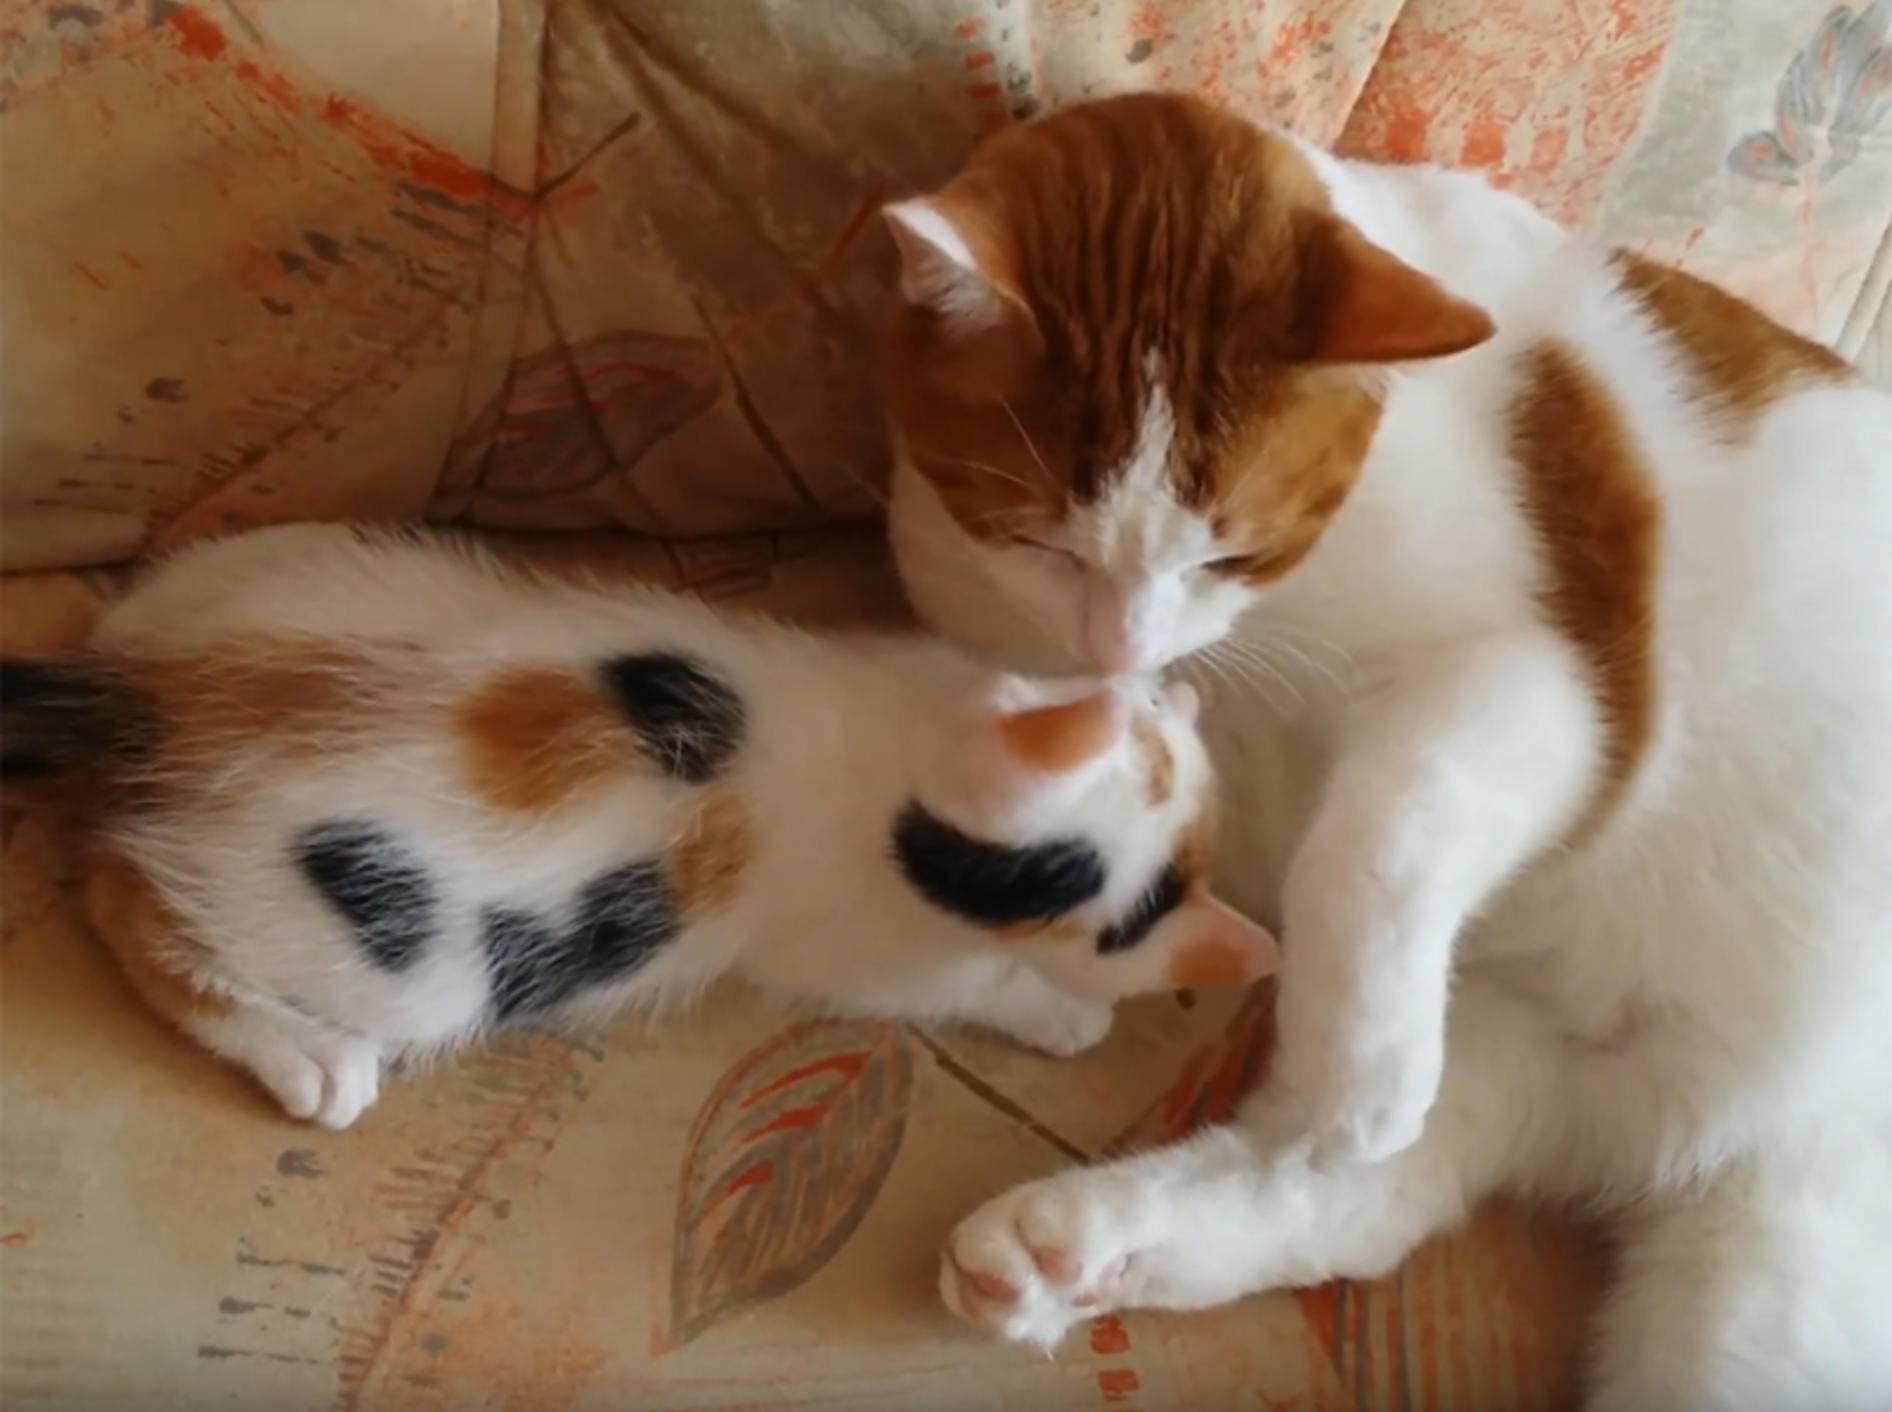 Glückskätzchen Lunny kuschelt mit Katzenkumpel Spaarky – YouTube / Silke Schloten